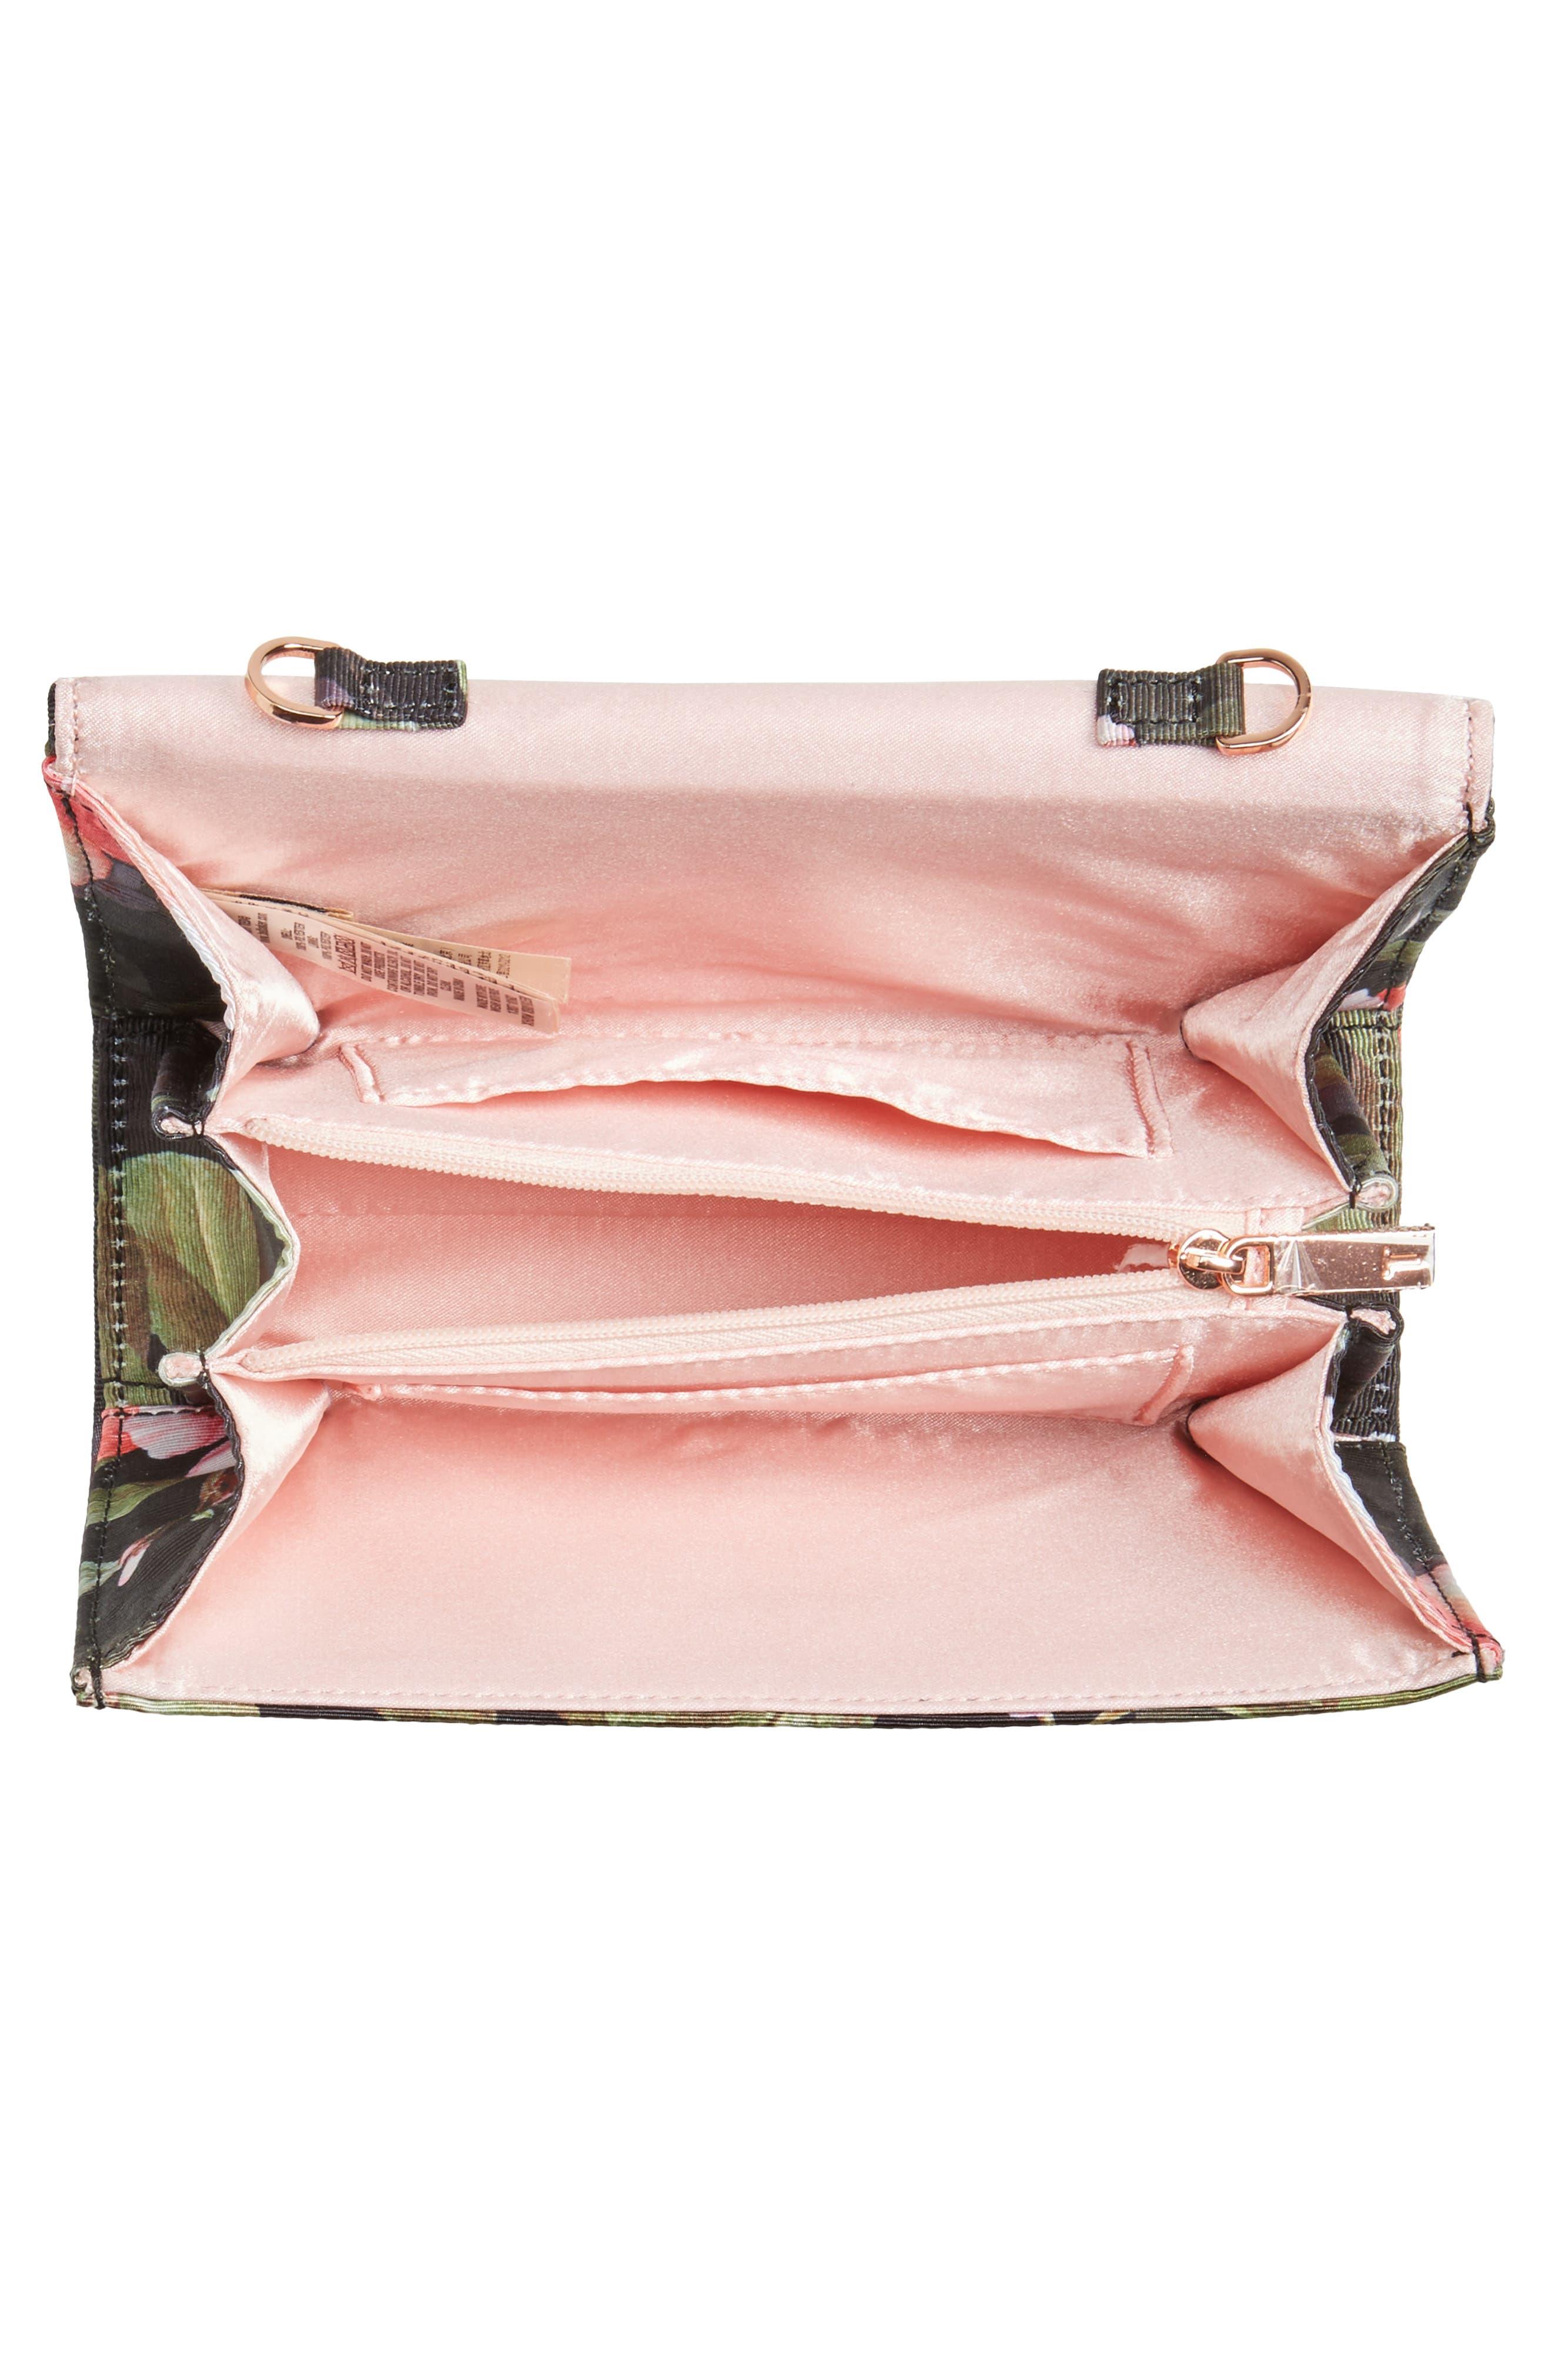 Pauleen Peach Blossom Crossbody Bag,                             Alternate thumbnail 4, color,                             Black